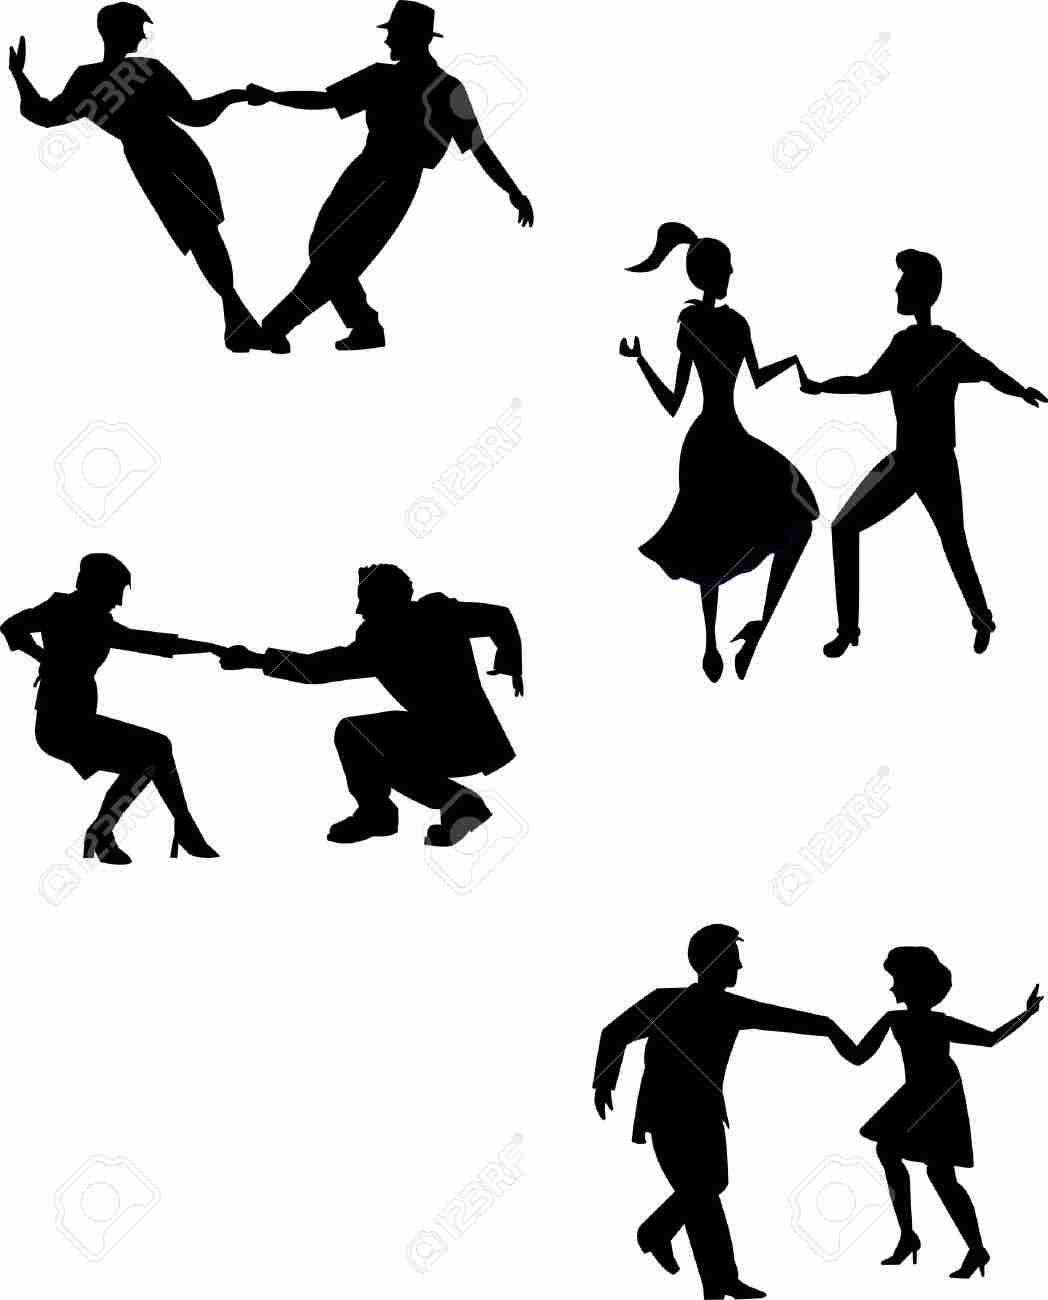 1048x1300 Clip Art Swing Dance Mesmerizing Dancer Silhouette Olegratiy